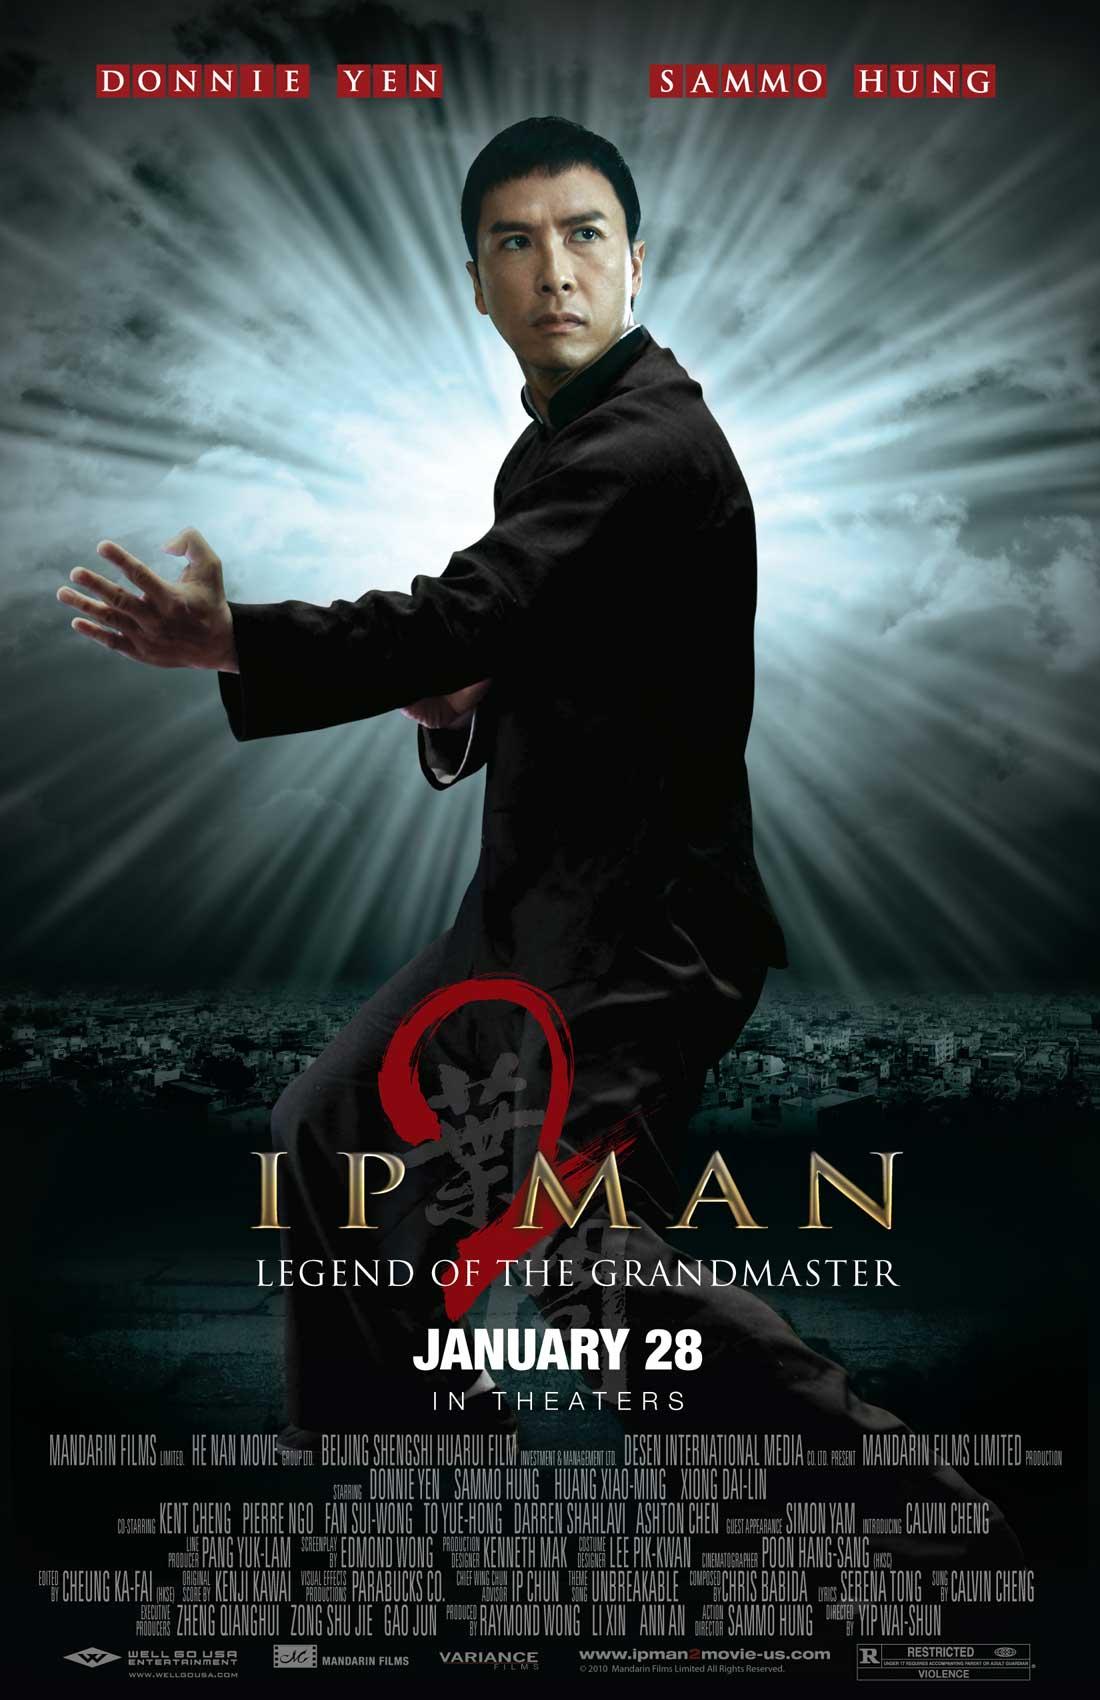 legend of the grandmaster film recenzja donnie yen sammo hung